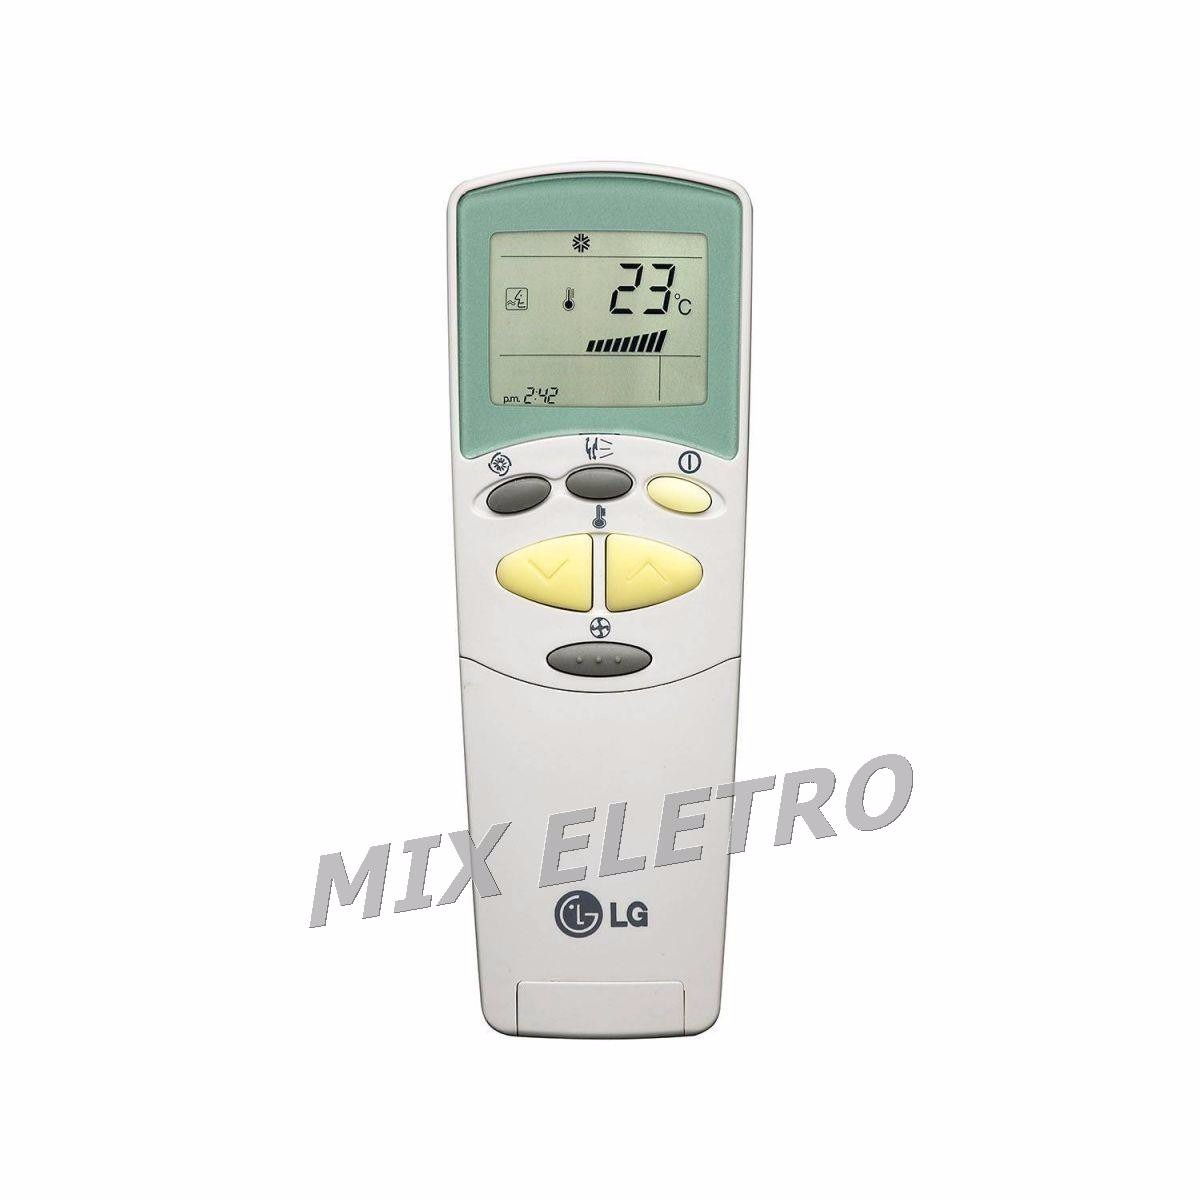 Controle remoto para Ar Condicionado LG Hero Inverter  - Mix Eletro